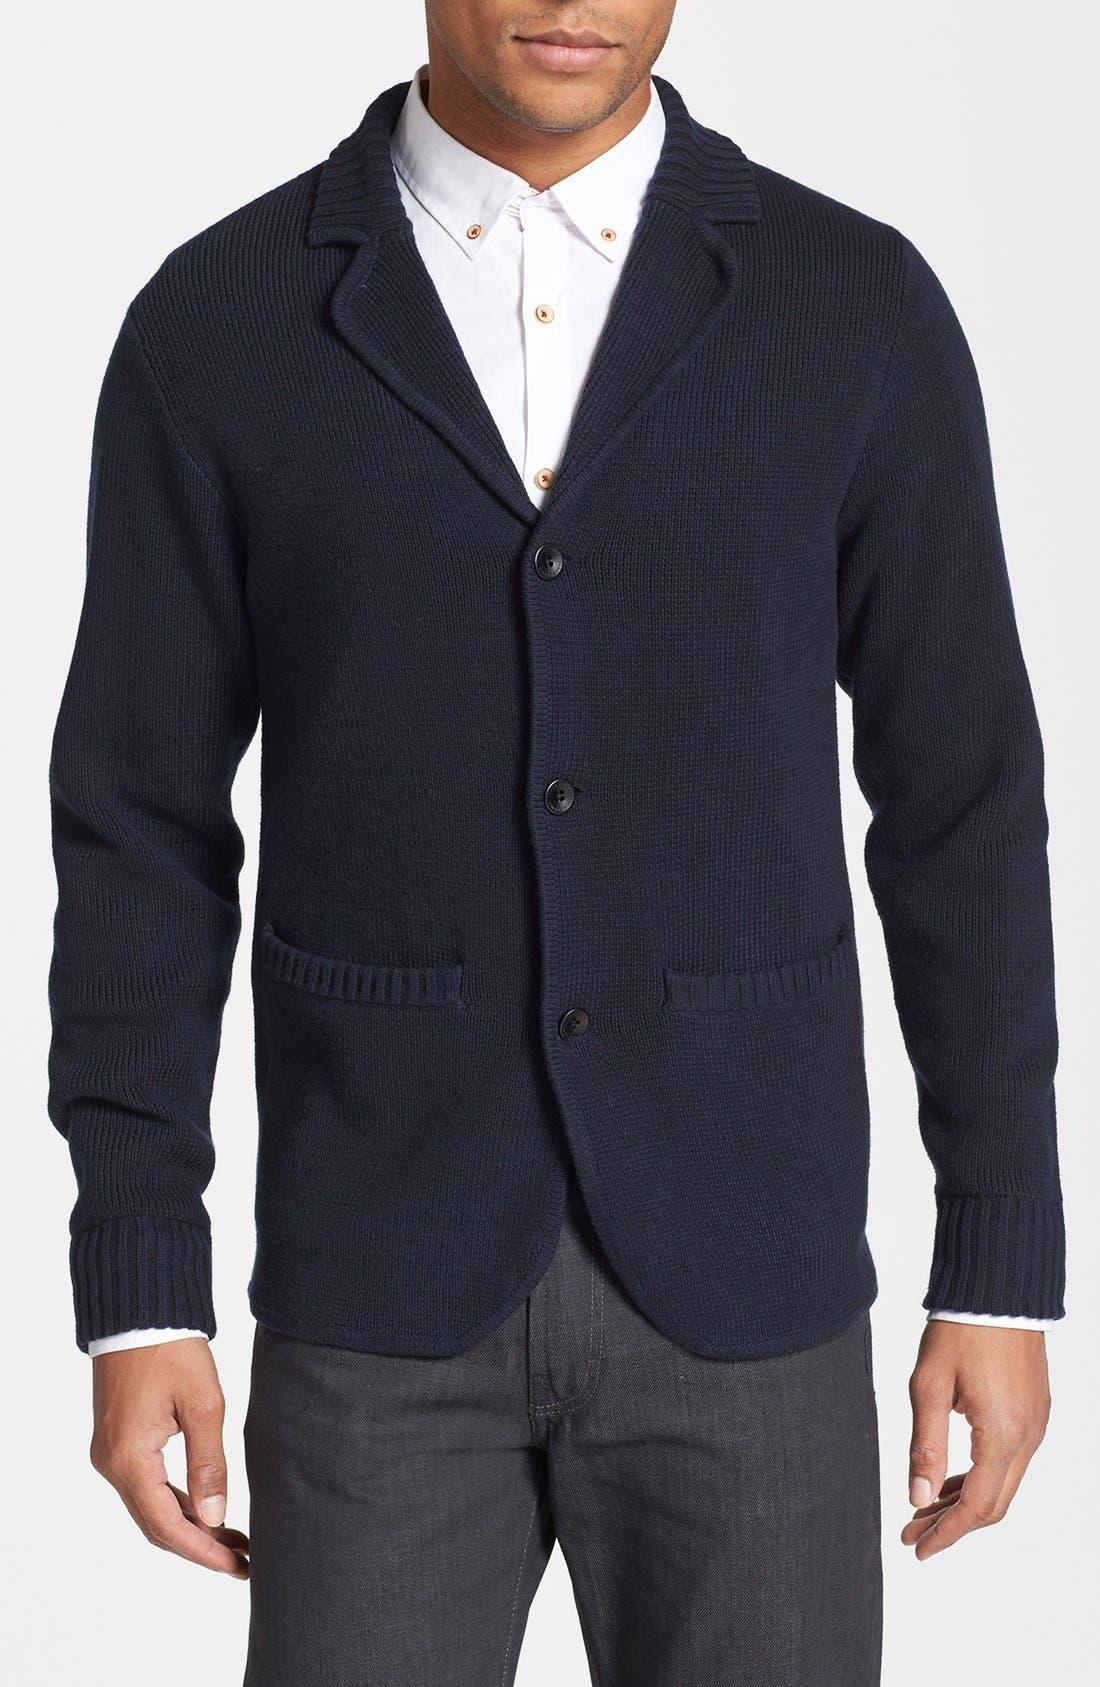 Alternate Image 1 Selected - Vince Camuto Slim Fit Blazer Cardigan